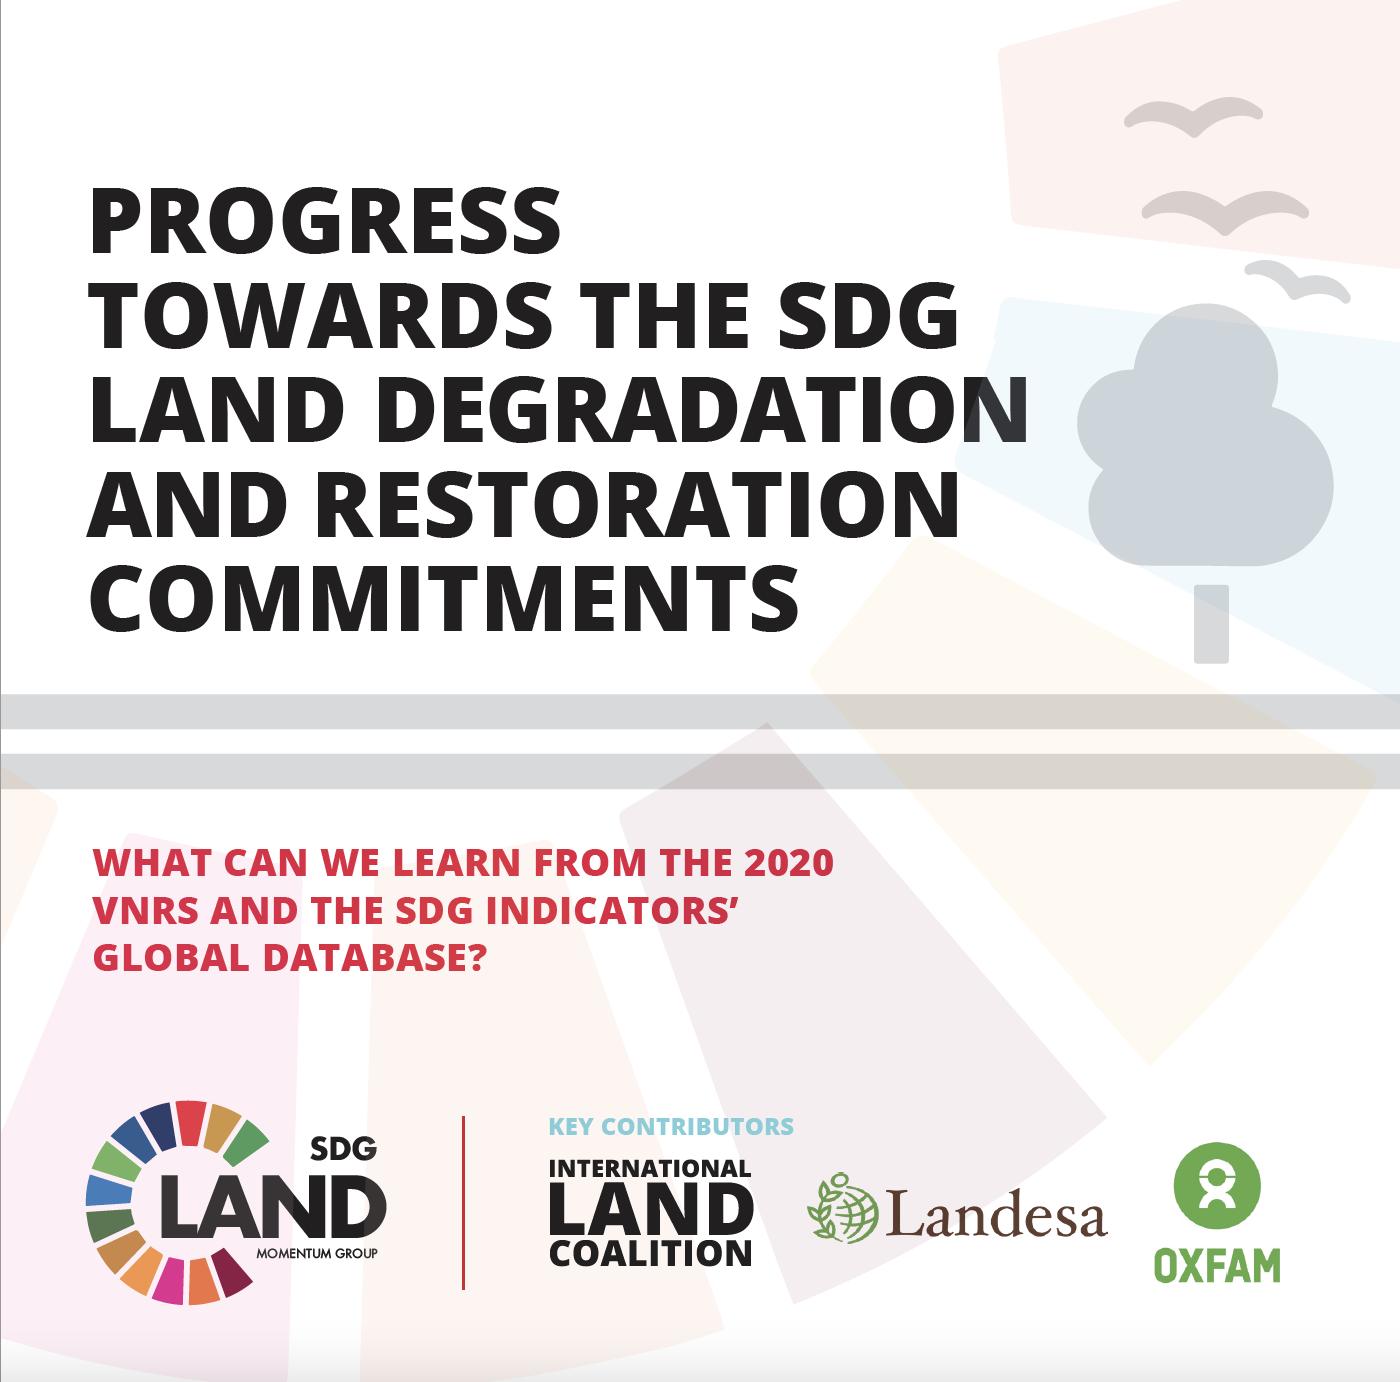 PROGRESS TOWARDS THE SDG LAND DEGRADATION AND RESTORATION COMMITMENTS